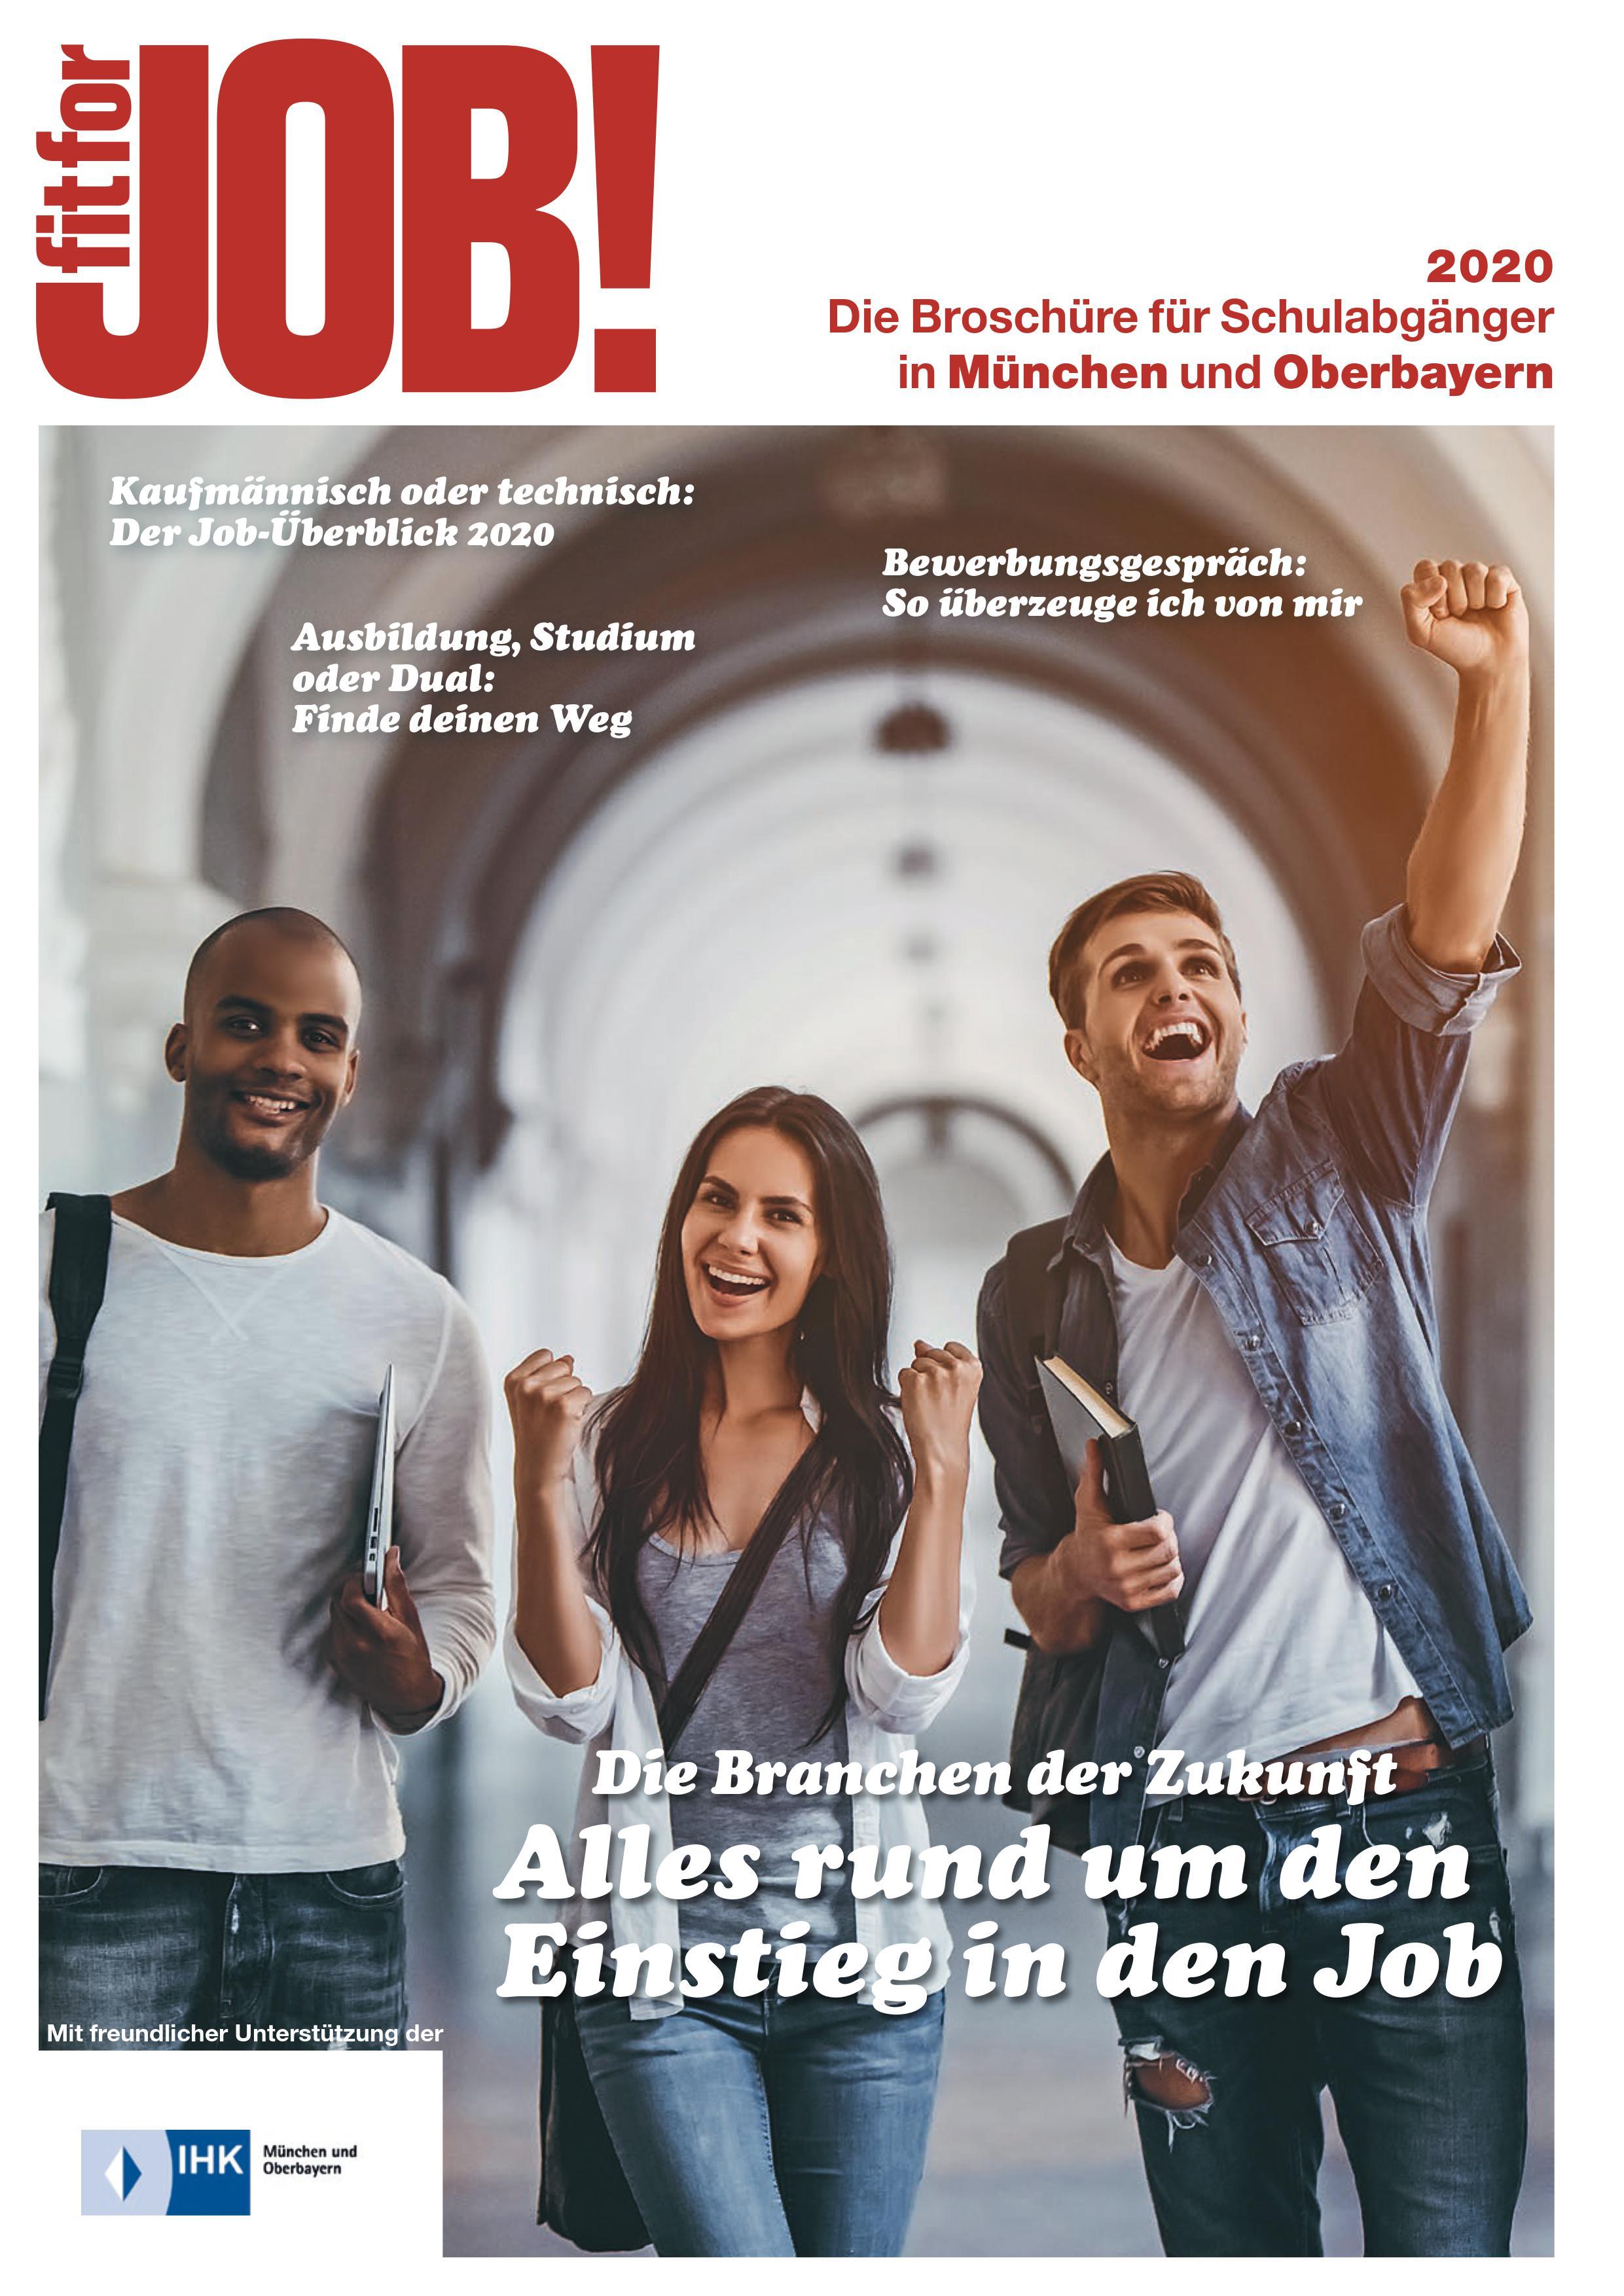 fit for Job! München und Oberbayern